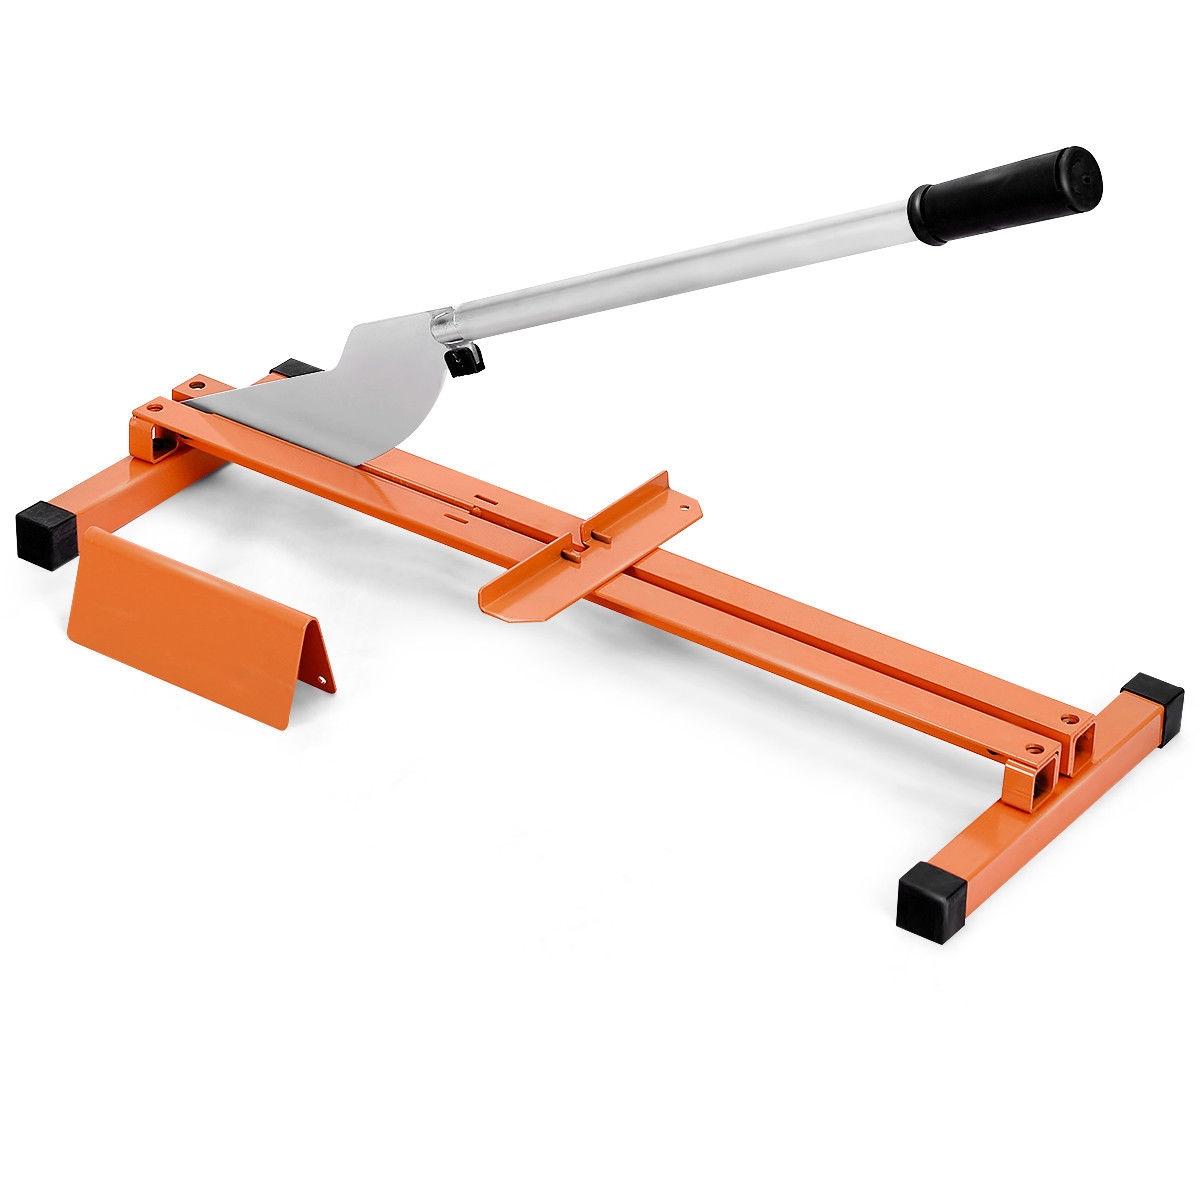 Laminate Flooring Cutter Hand Tool V-Support Heavy Duty Steel